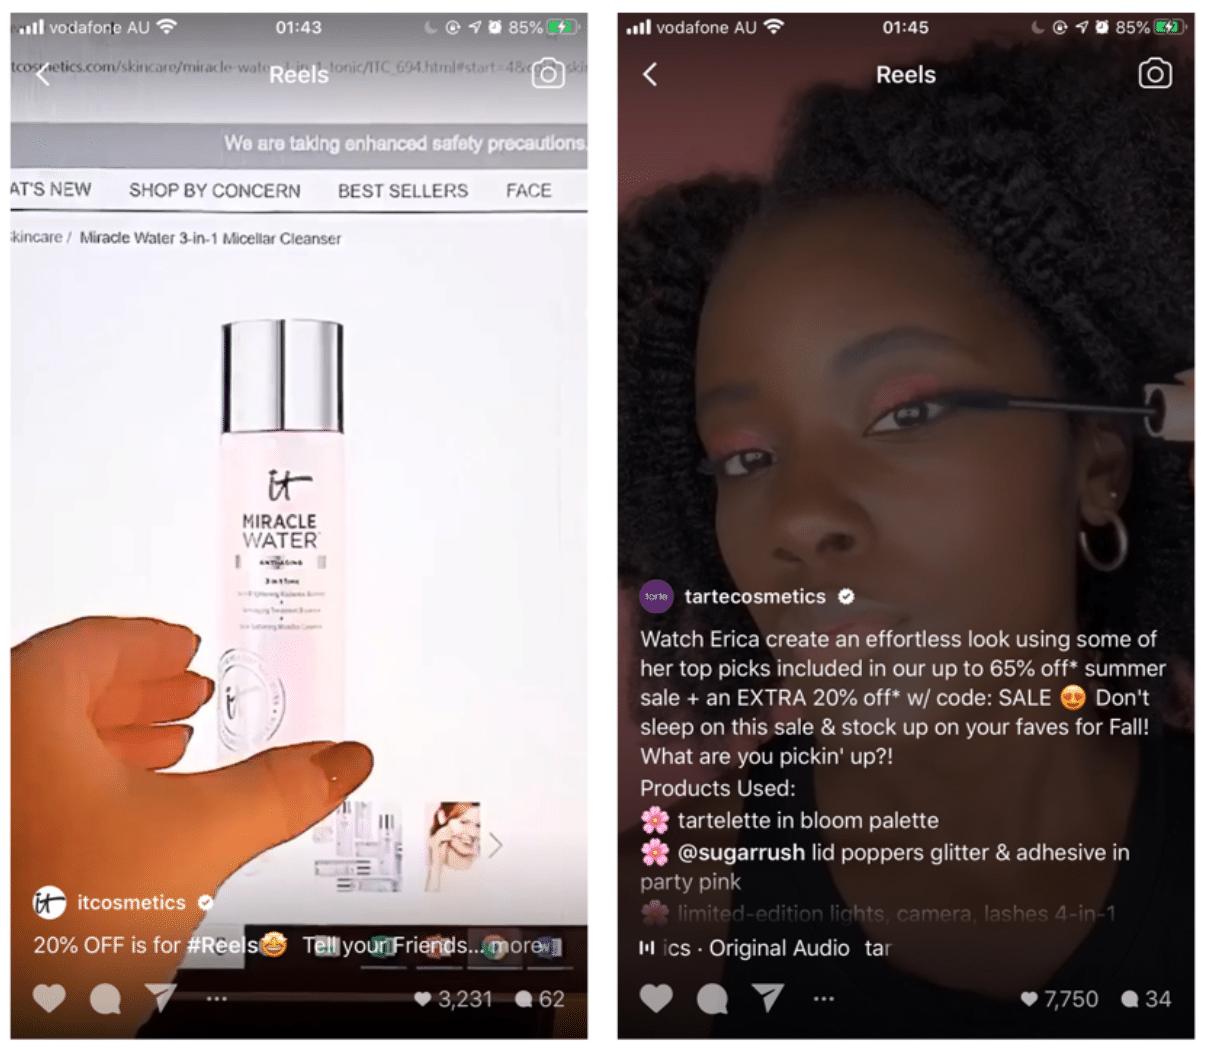 IT Cosmetics US and Tarte Cosmetics sales announcement